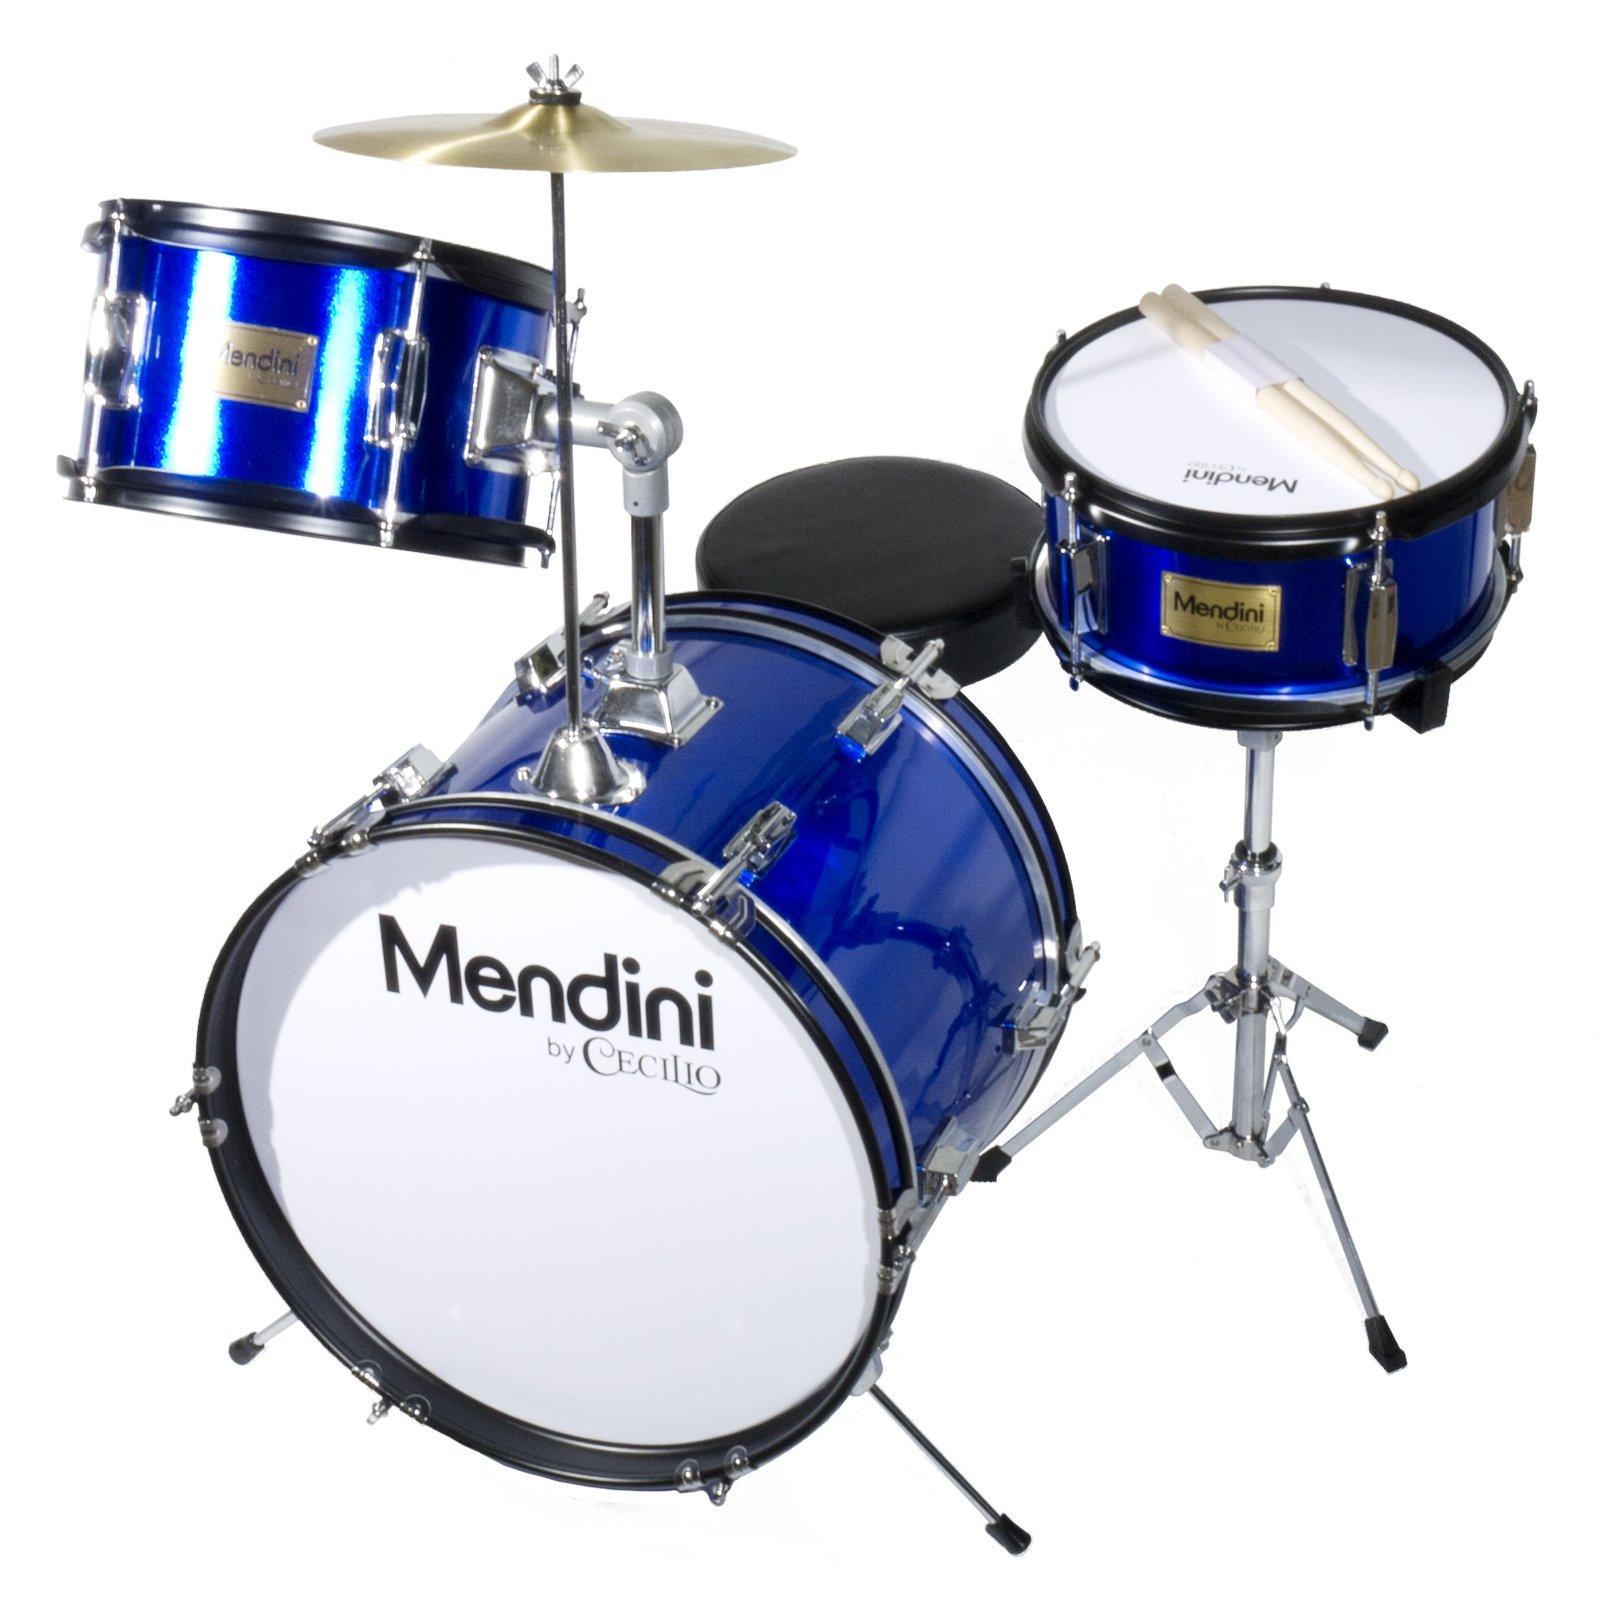 Mendini Adjustable Drumsticks Metallic MJDS 3 BL